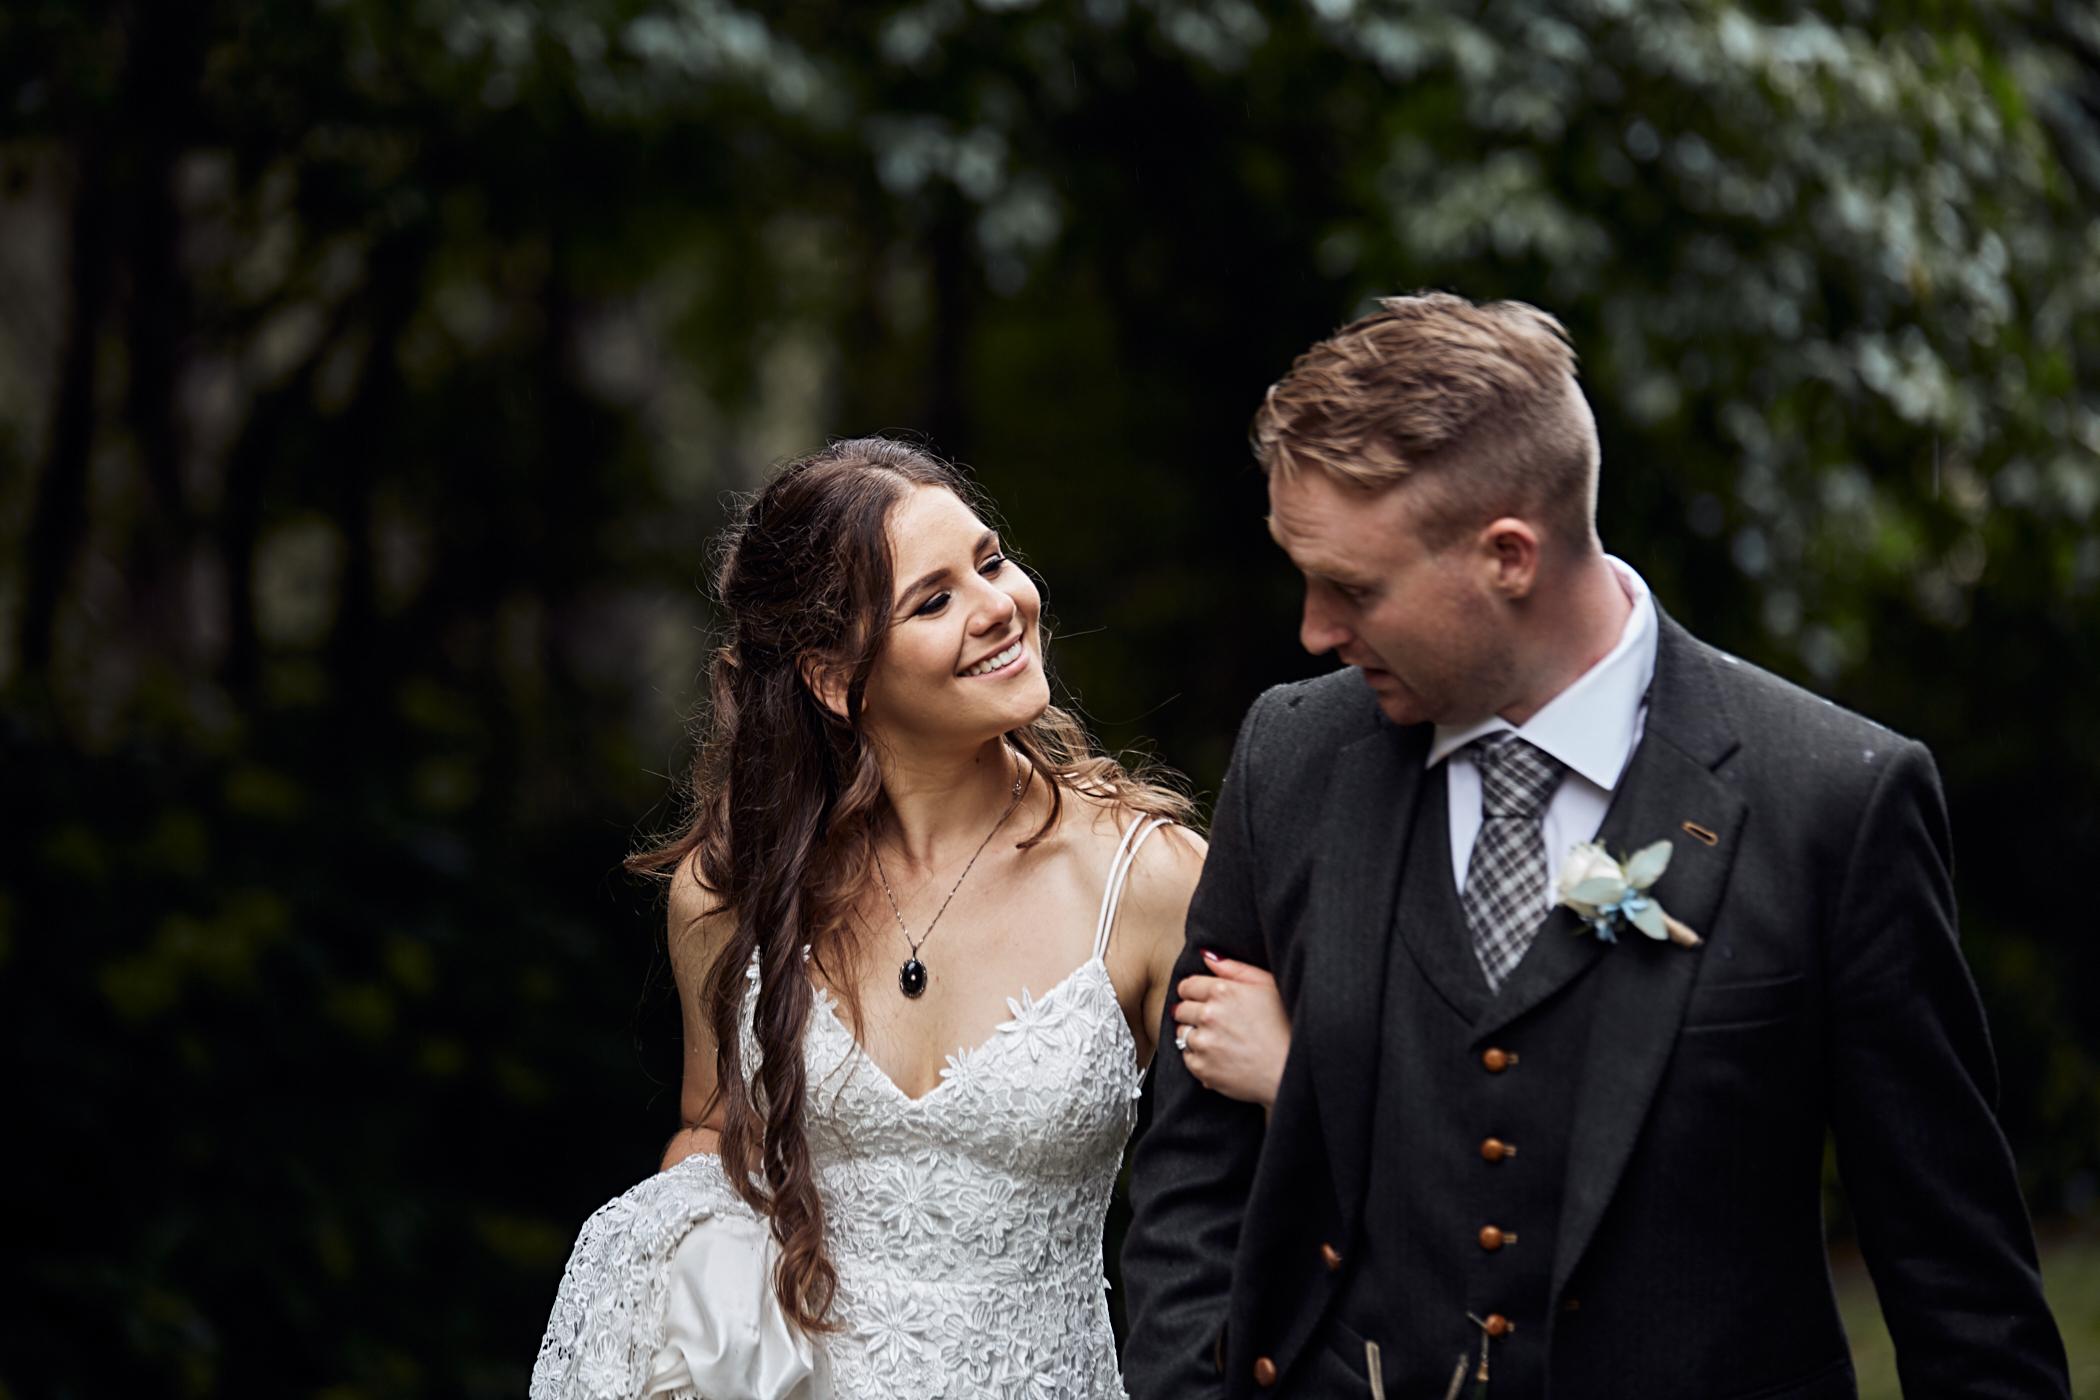 Wedding bliss